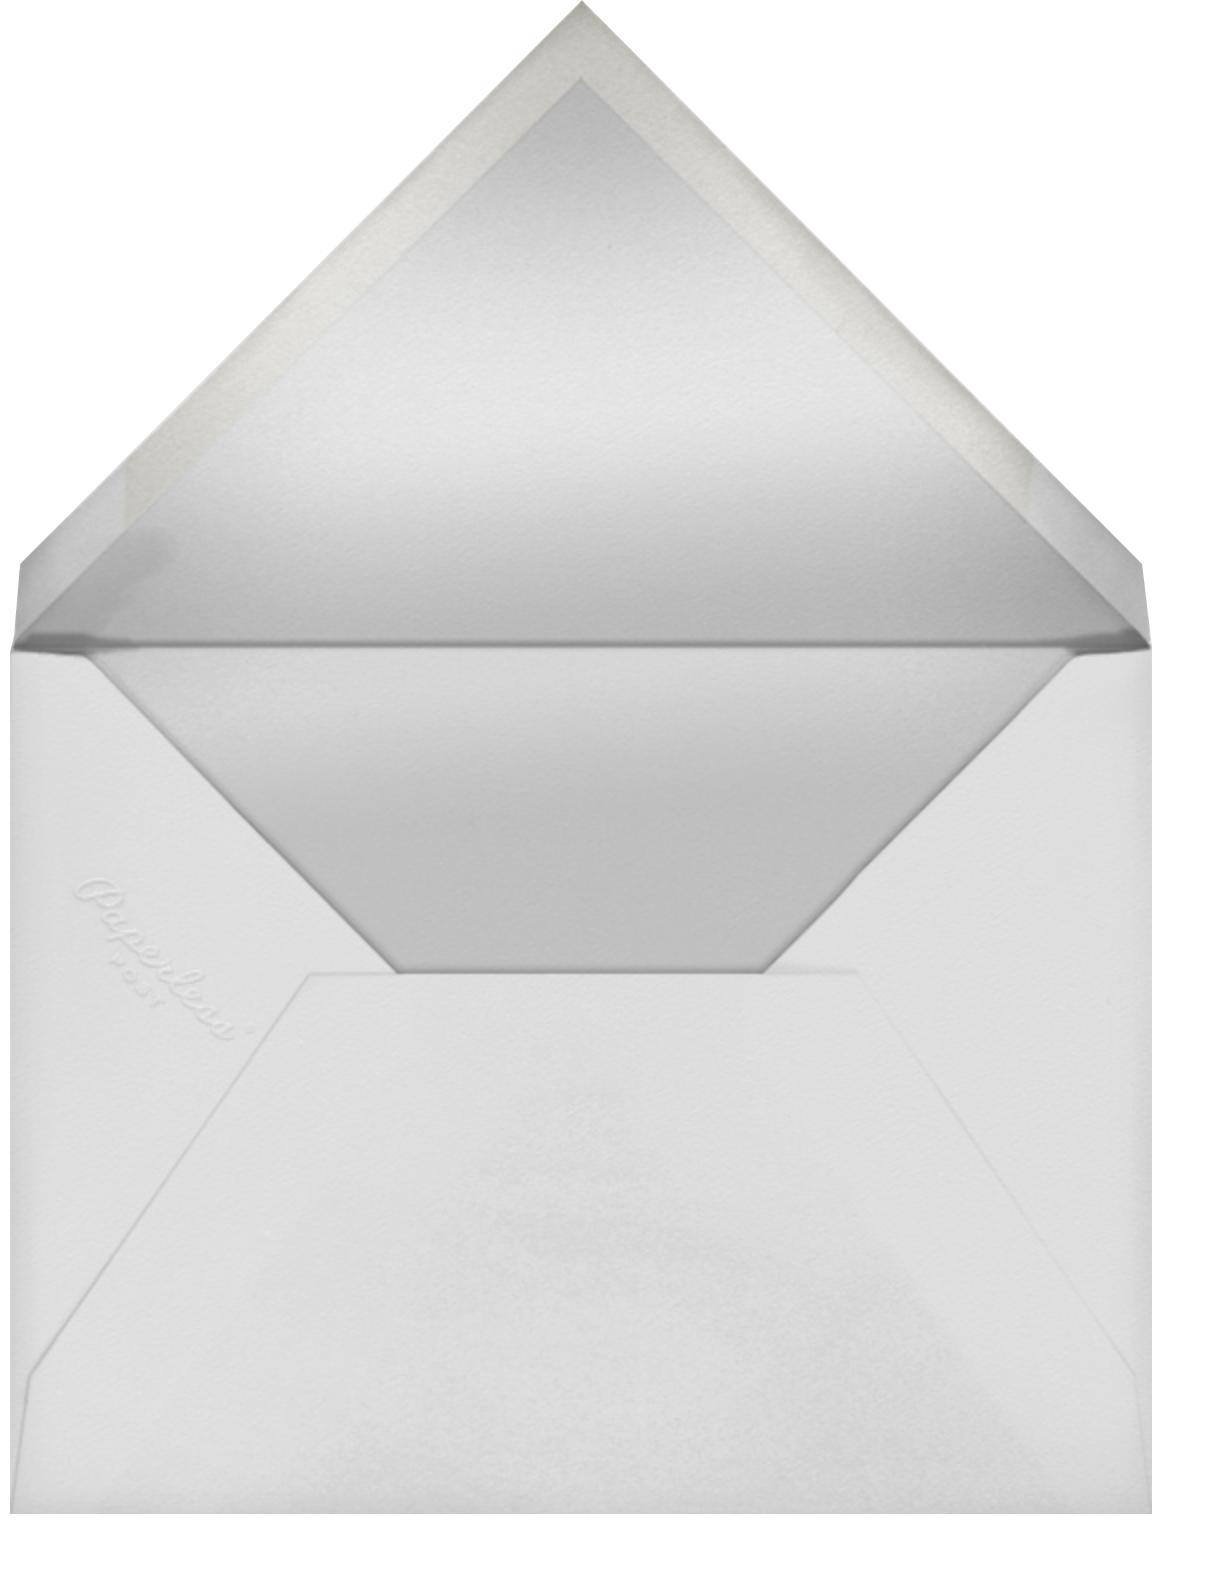 Choli (Program) - Red - Paperless Post - Menus and programs - envelope back